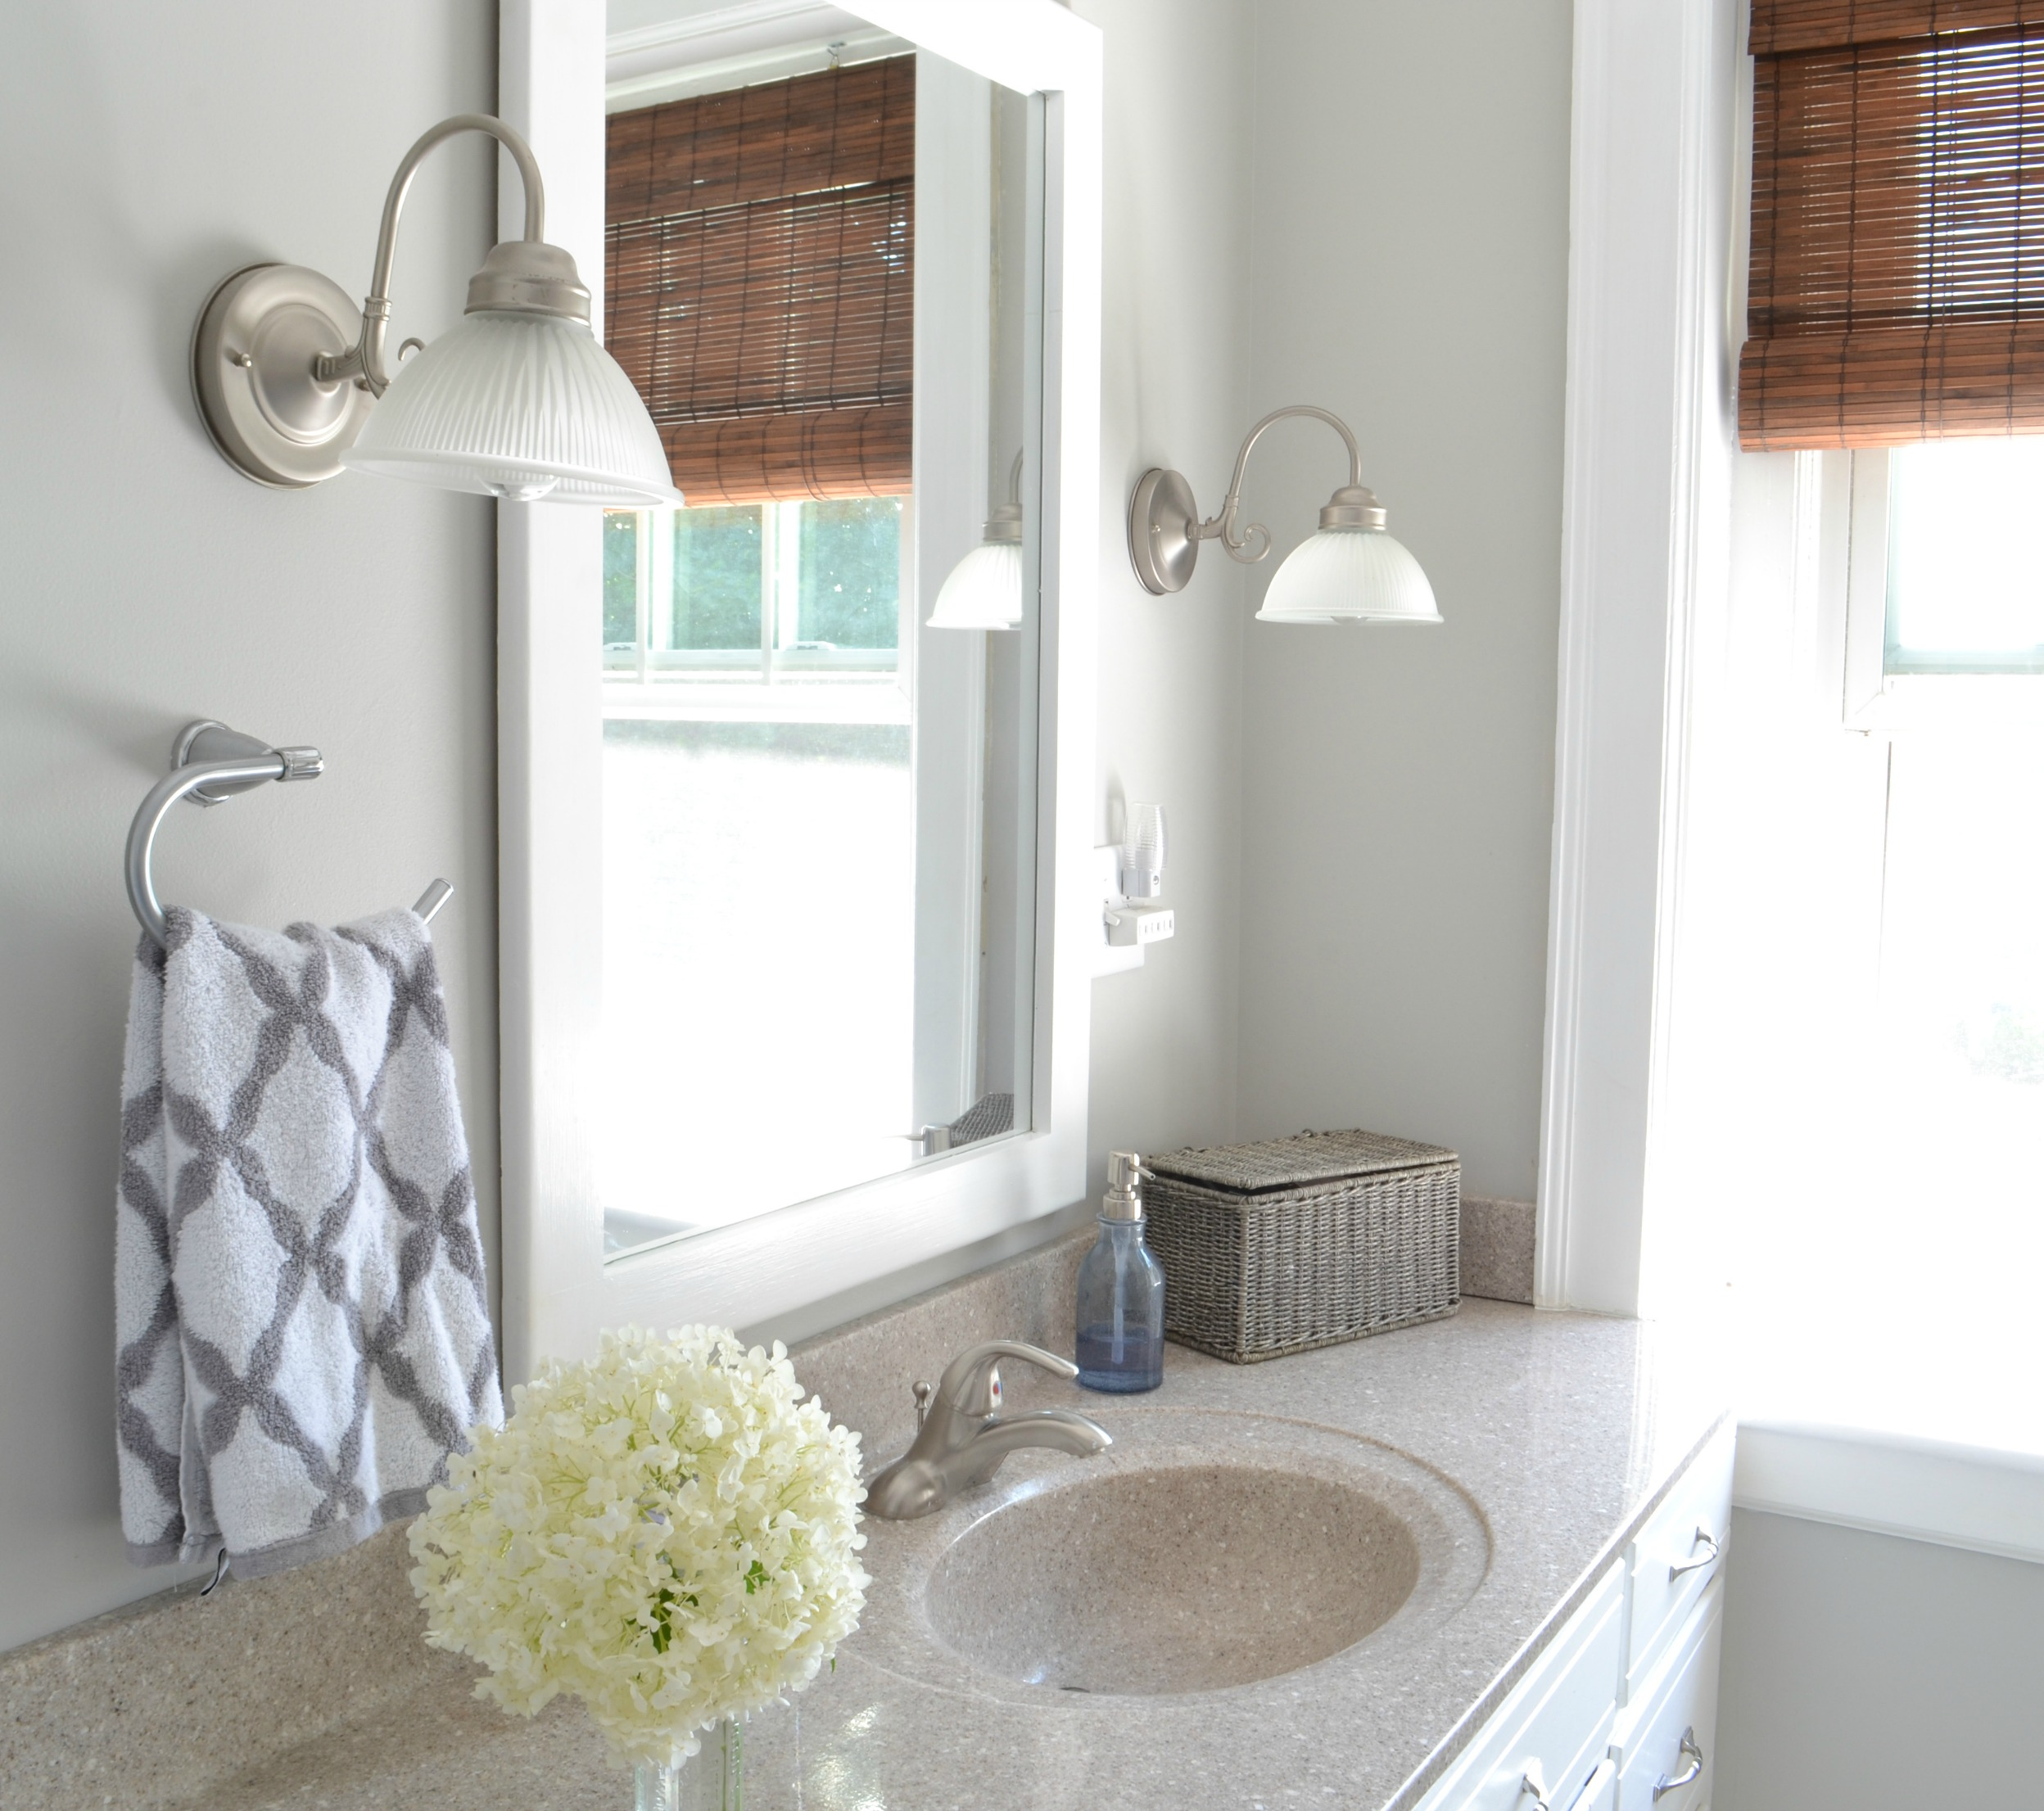 Bathroom Re-do {sharing a fav neutral paint color} - Aimee Weaver ...